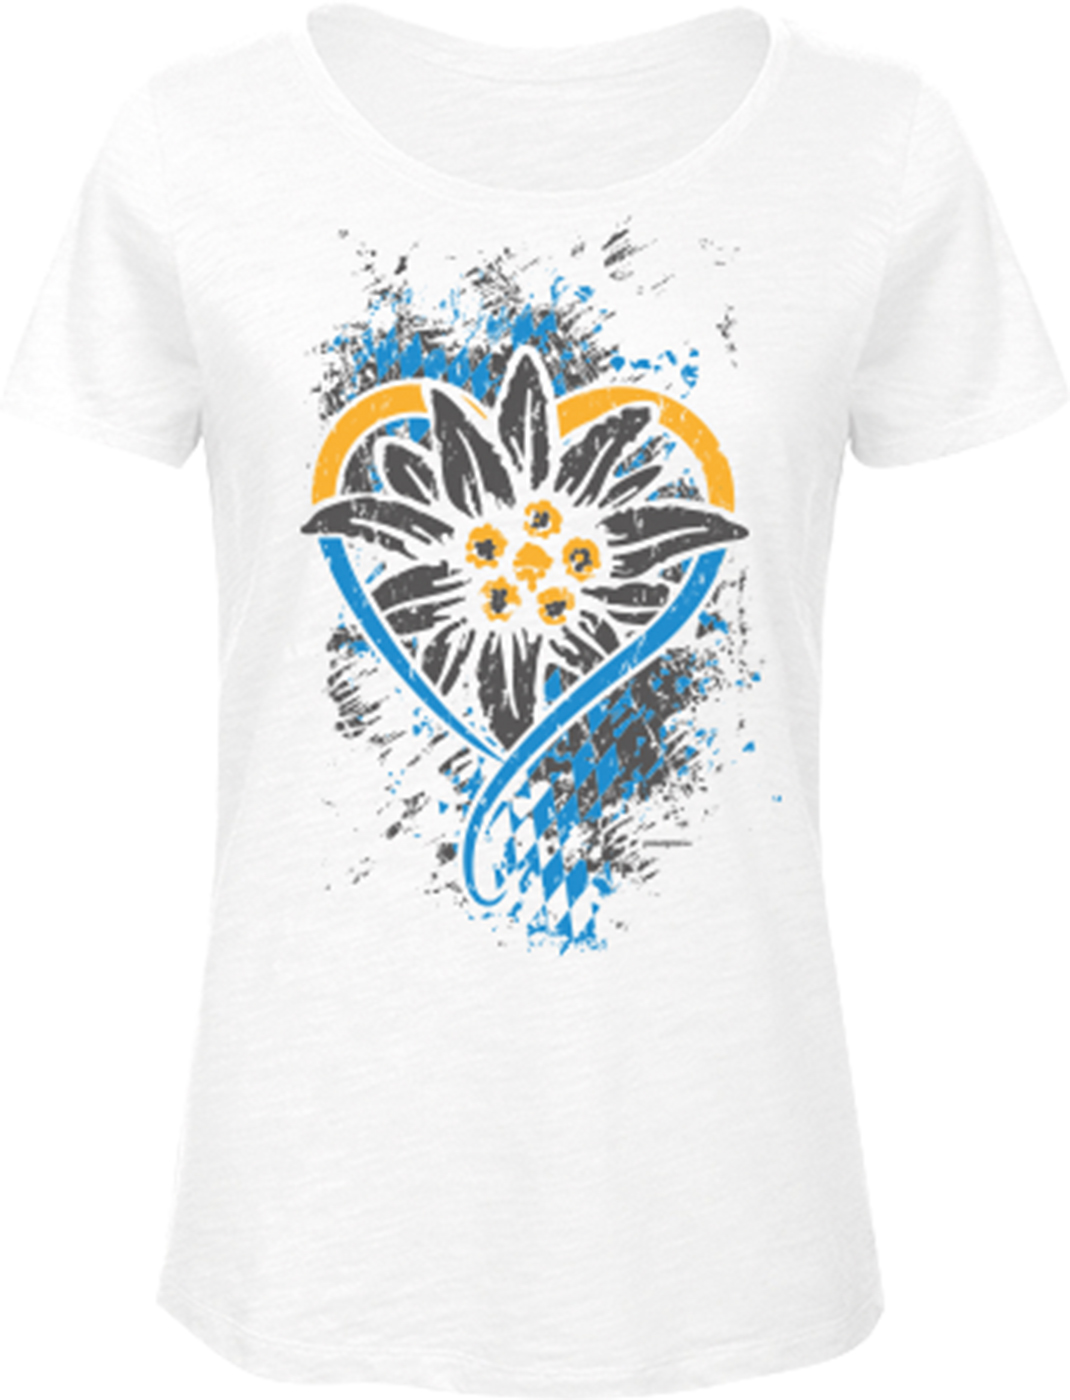 Frauen Trachten T-Shirt Bayern